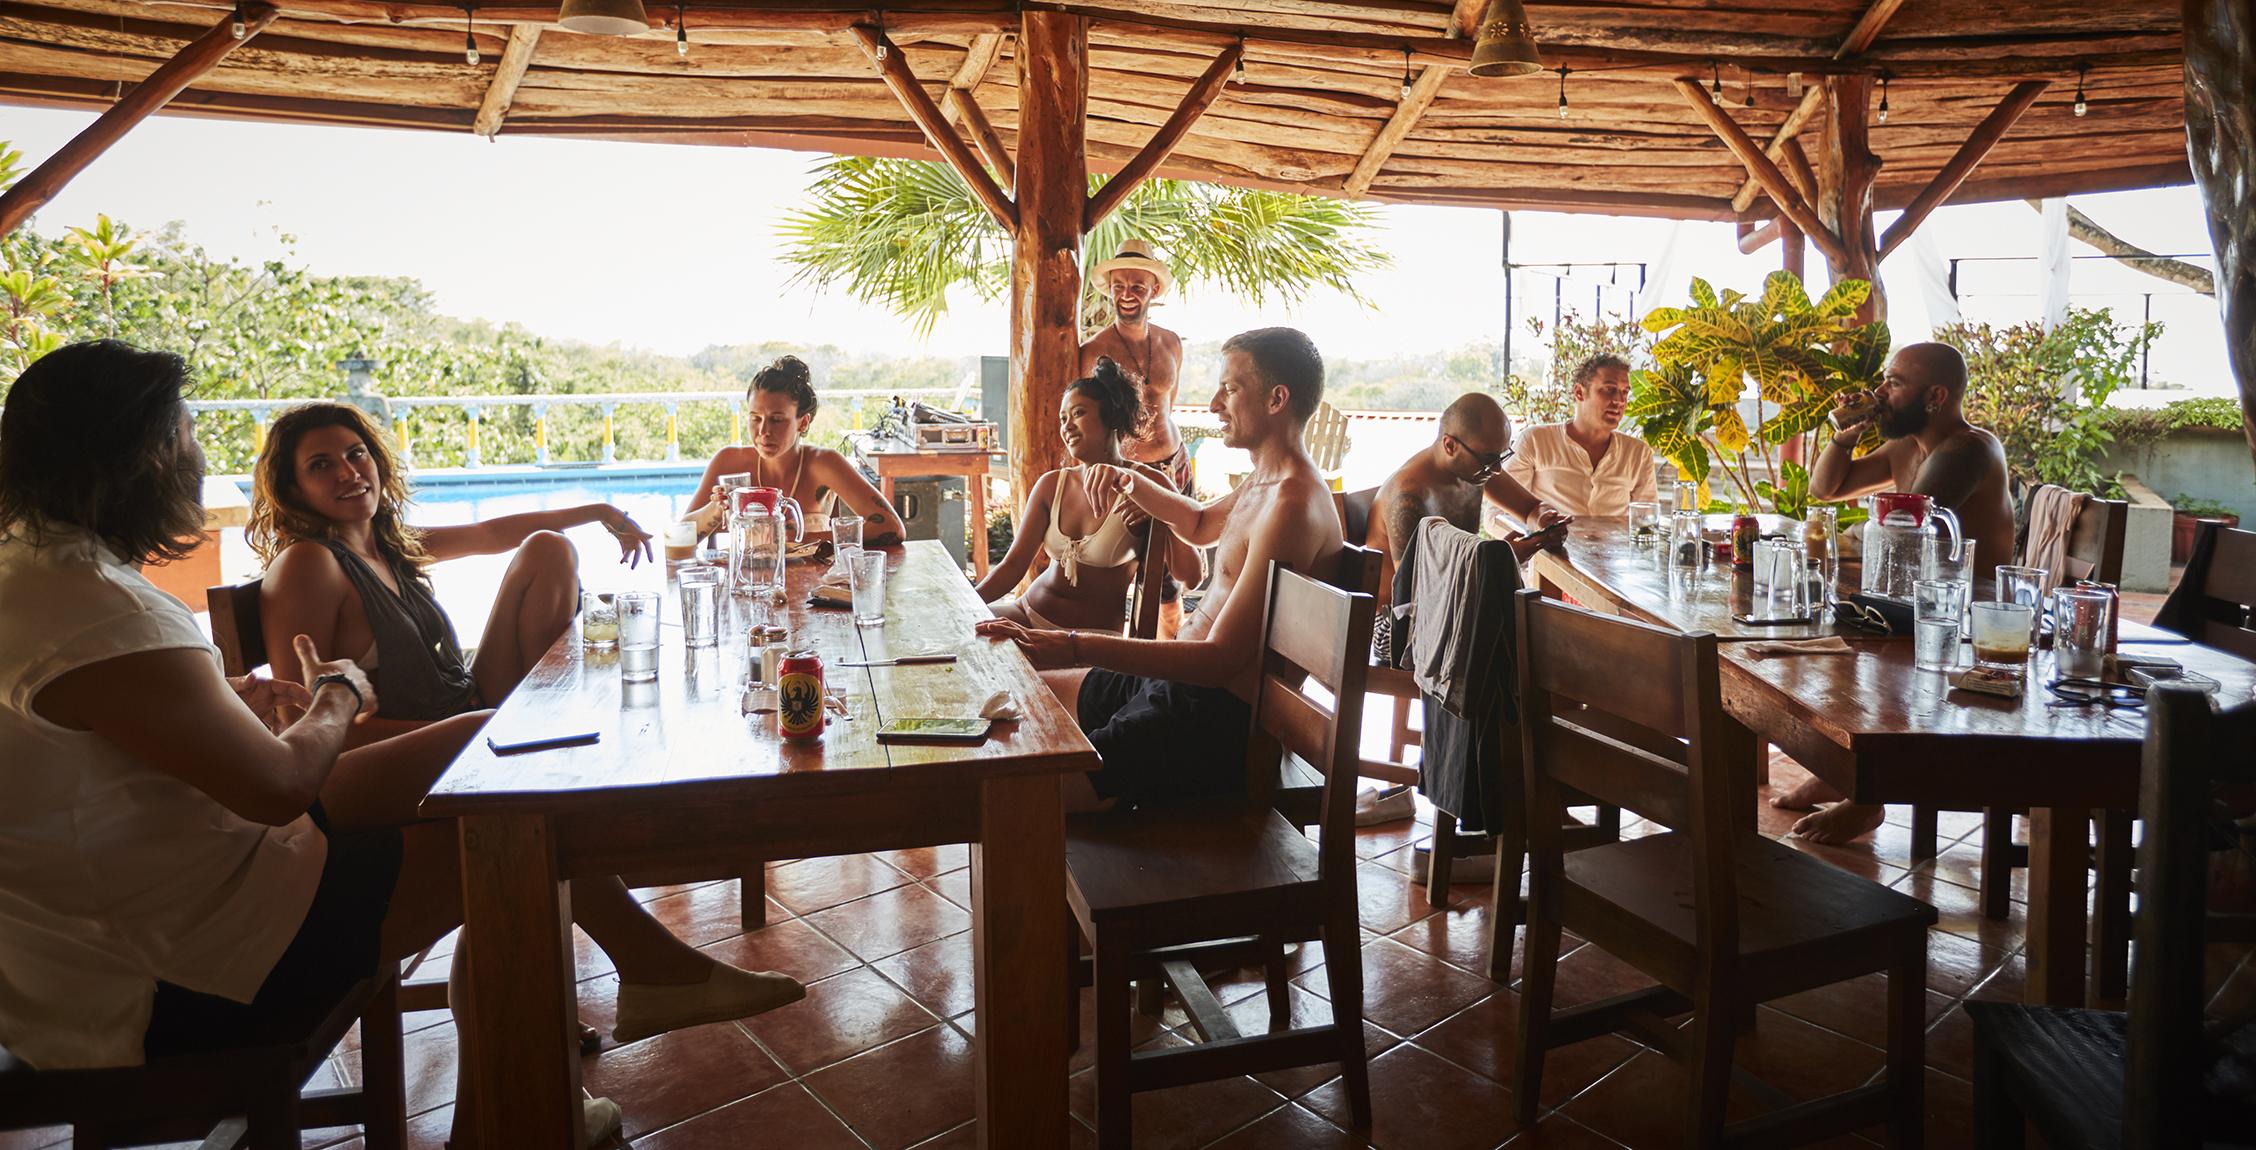 Rayos_Del_Sol_Costa_Rica_PA-RT_dining_3.jpg